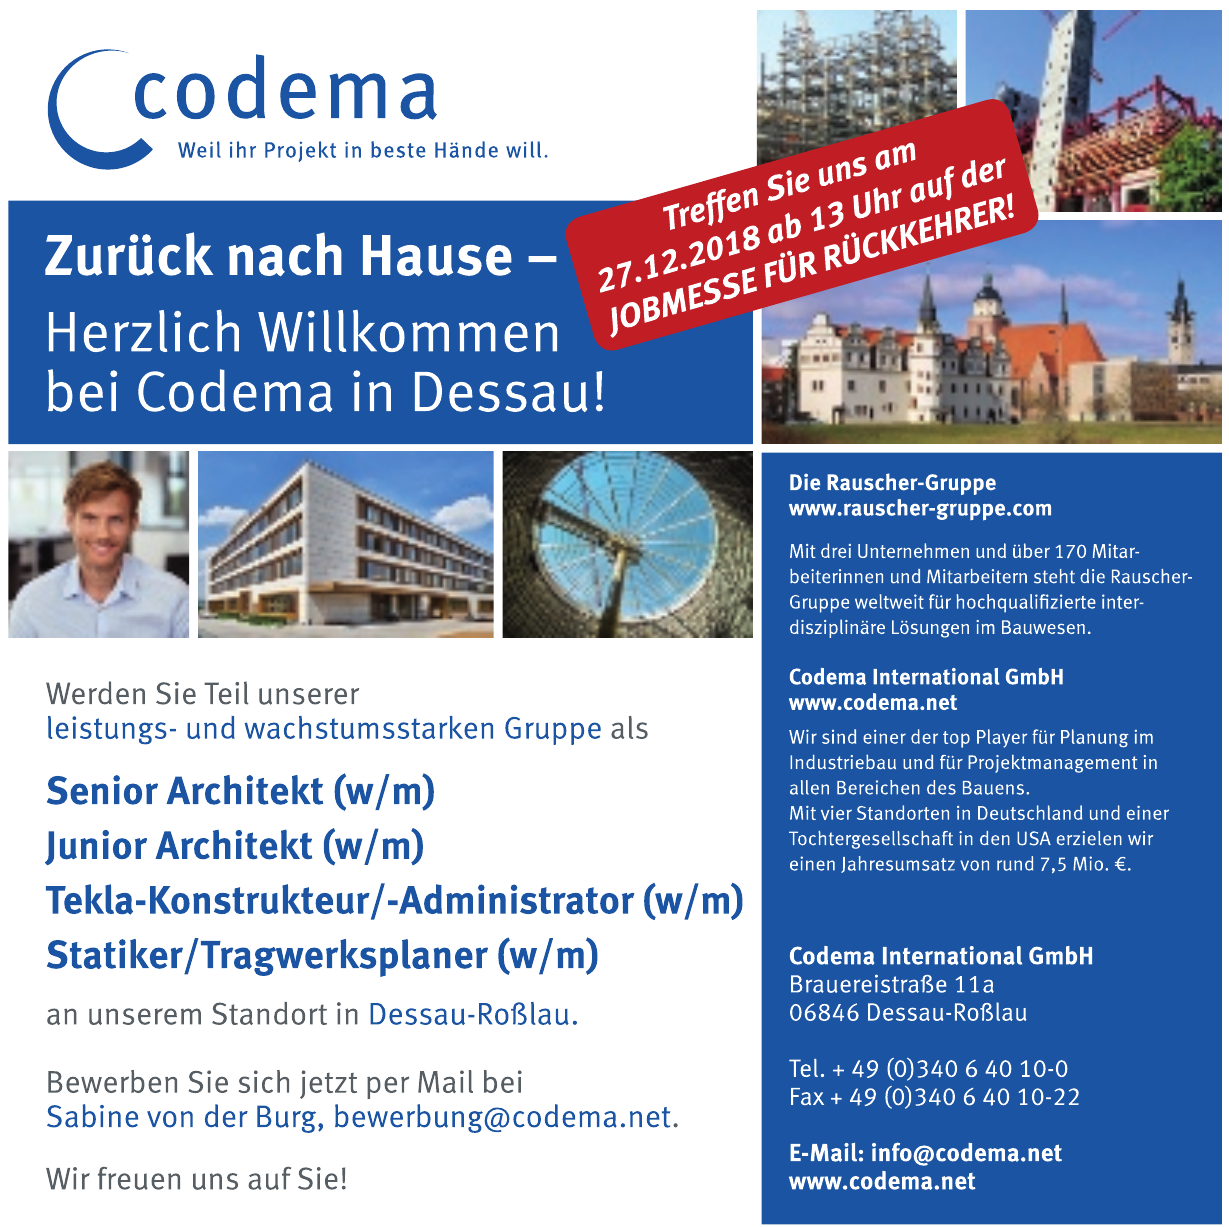 Codema International GmbH